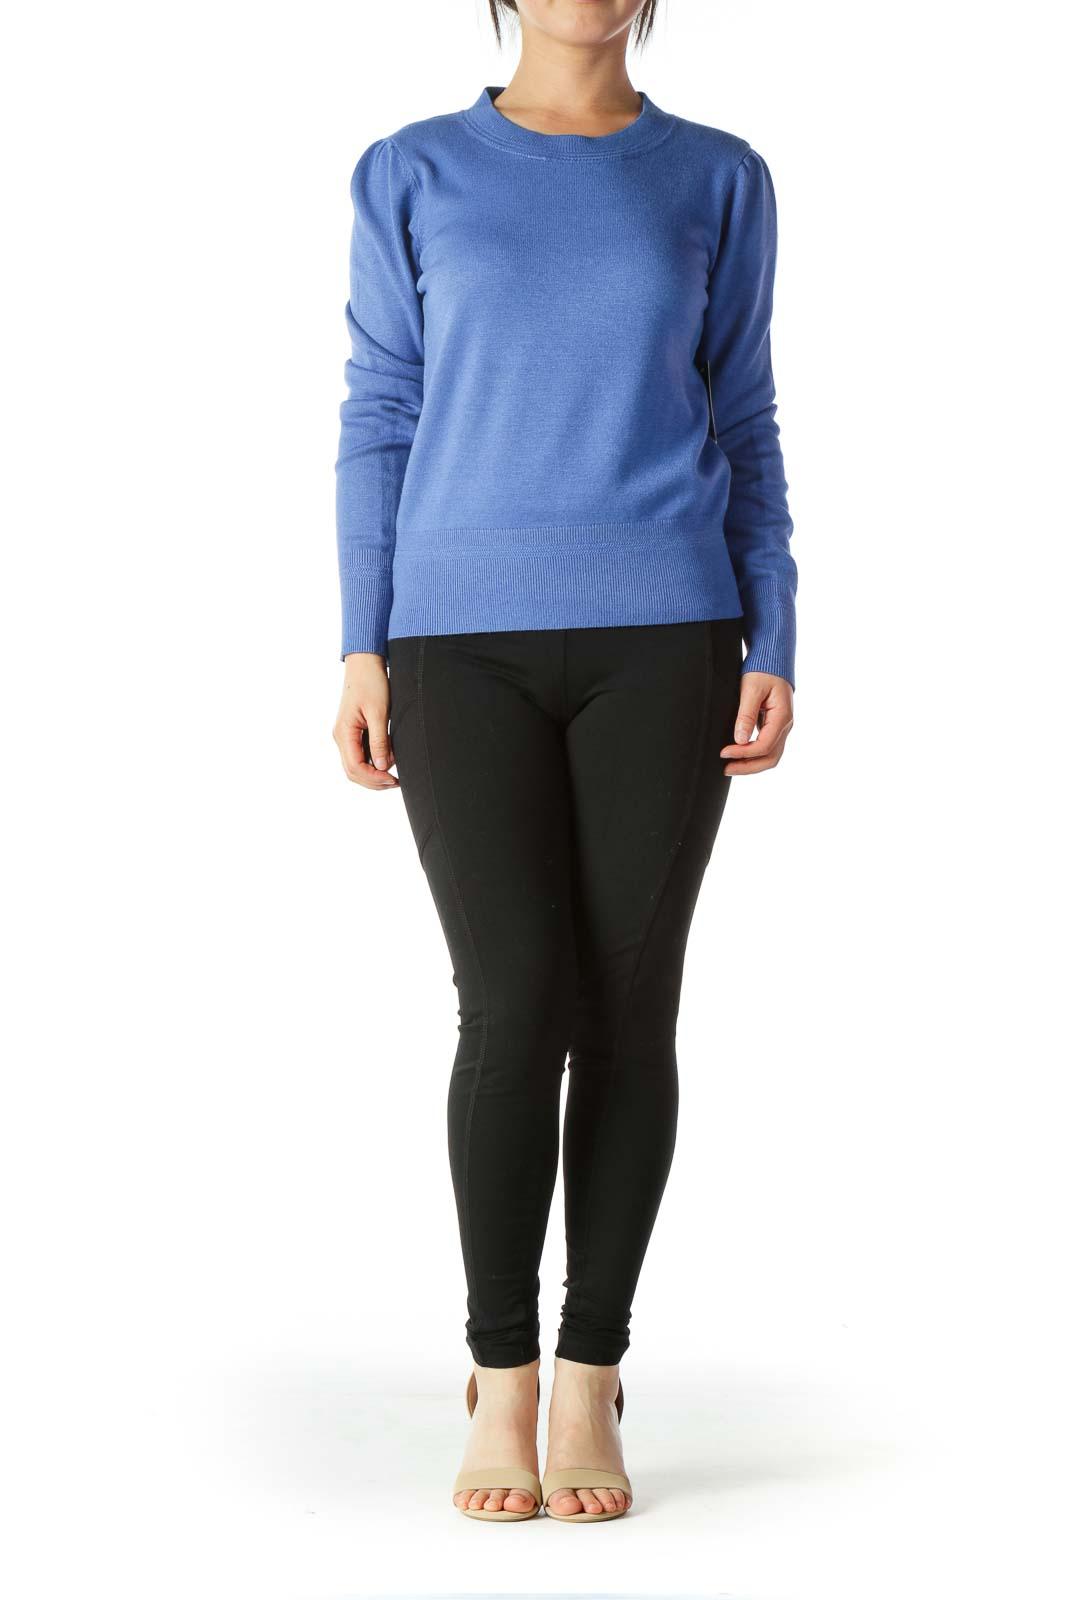 Blue Round-Neck Scrunched-Shoulder Detail Soft Sweater